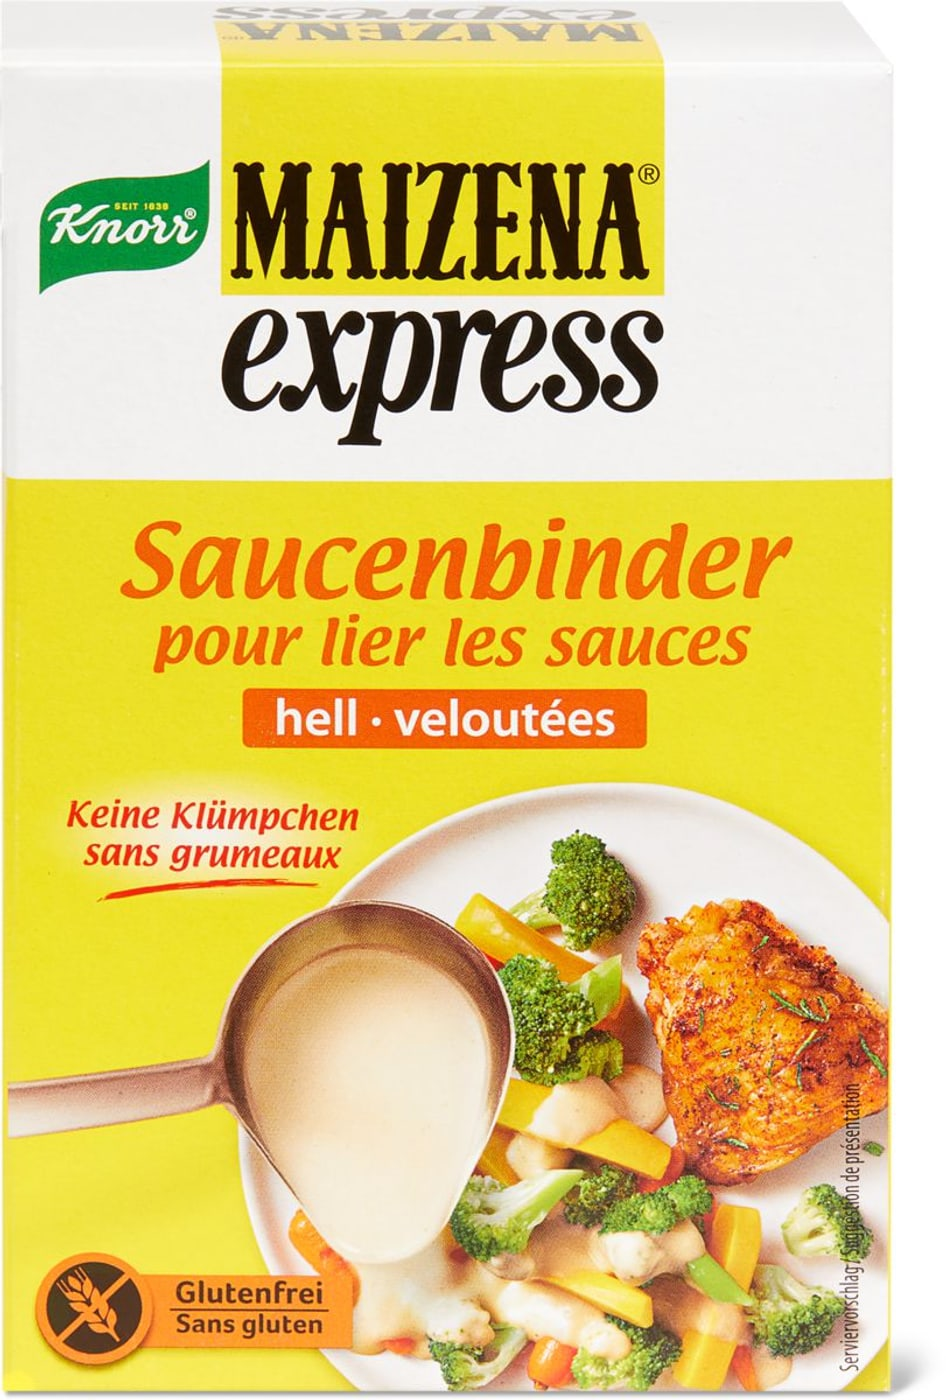 Saucenbinder